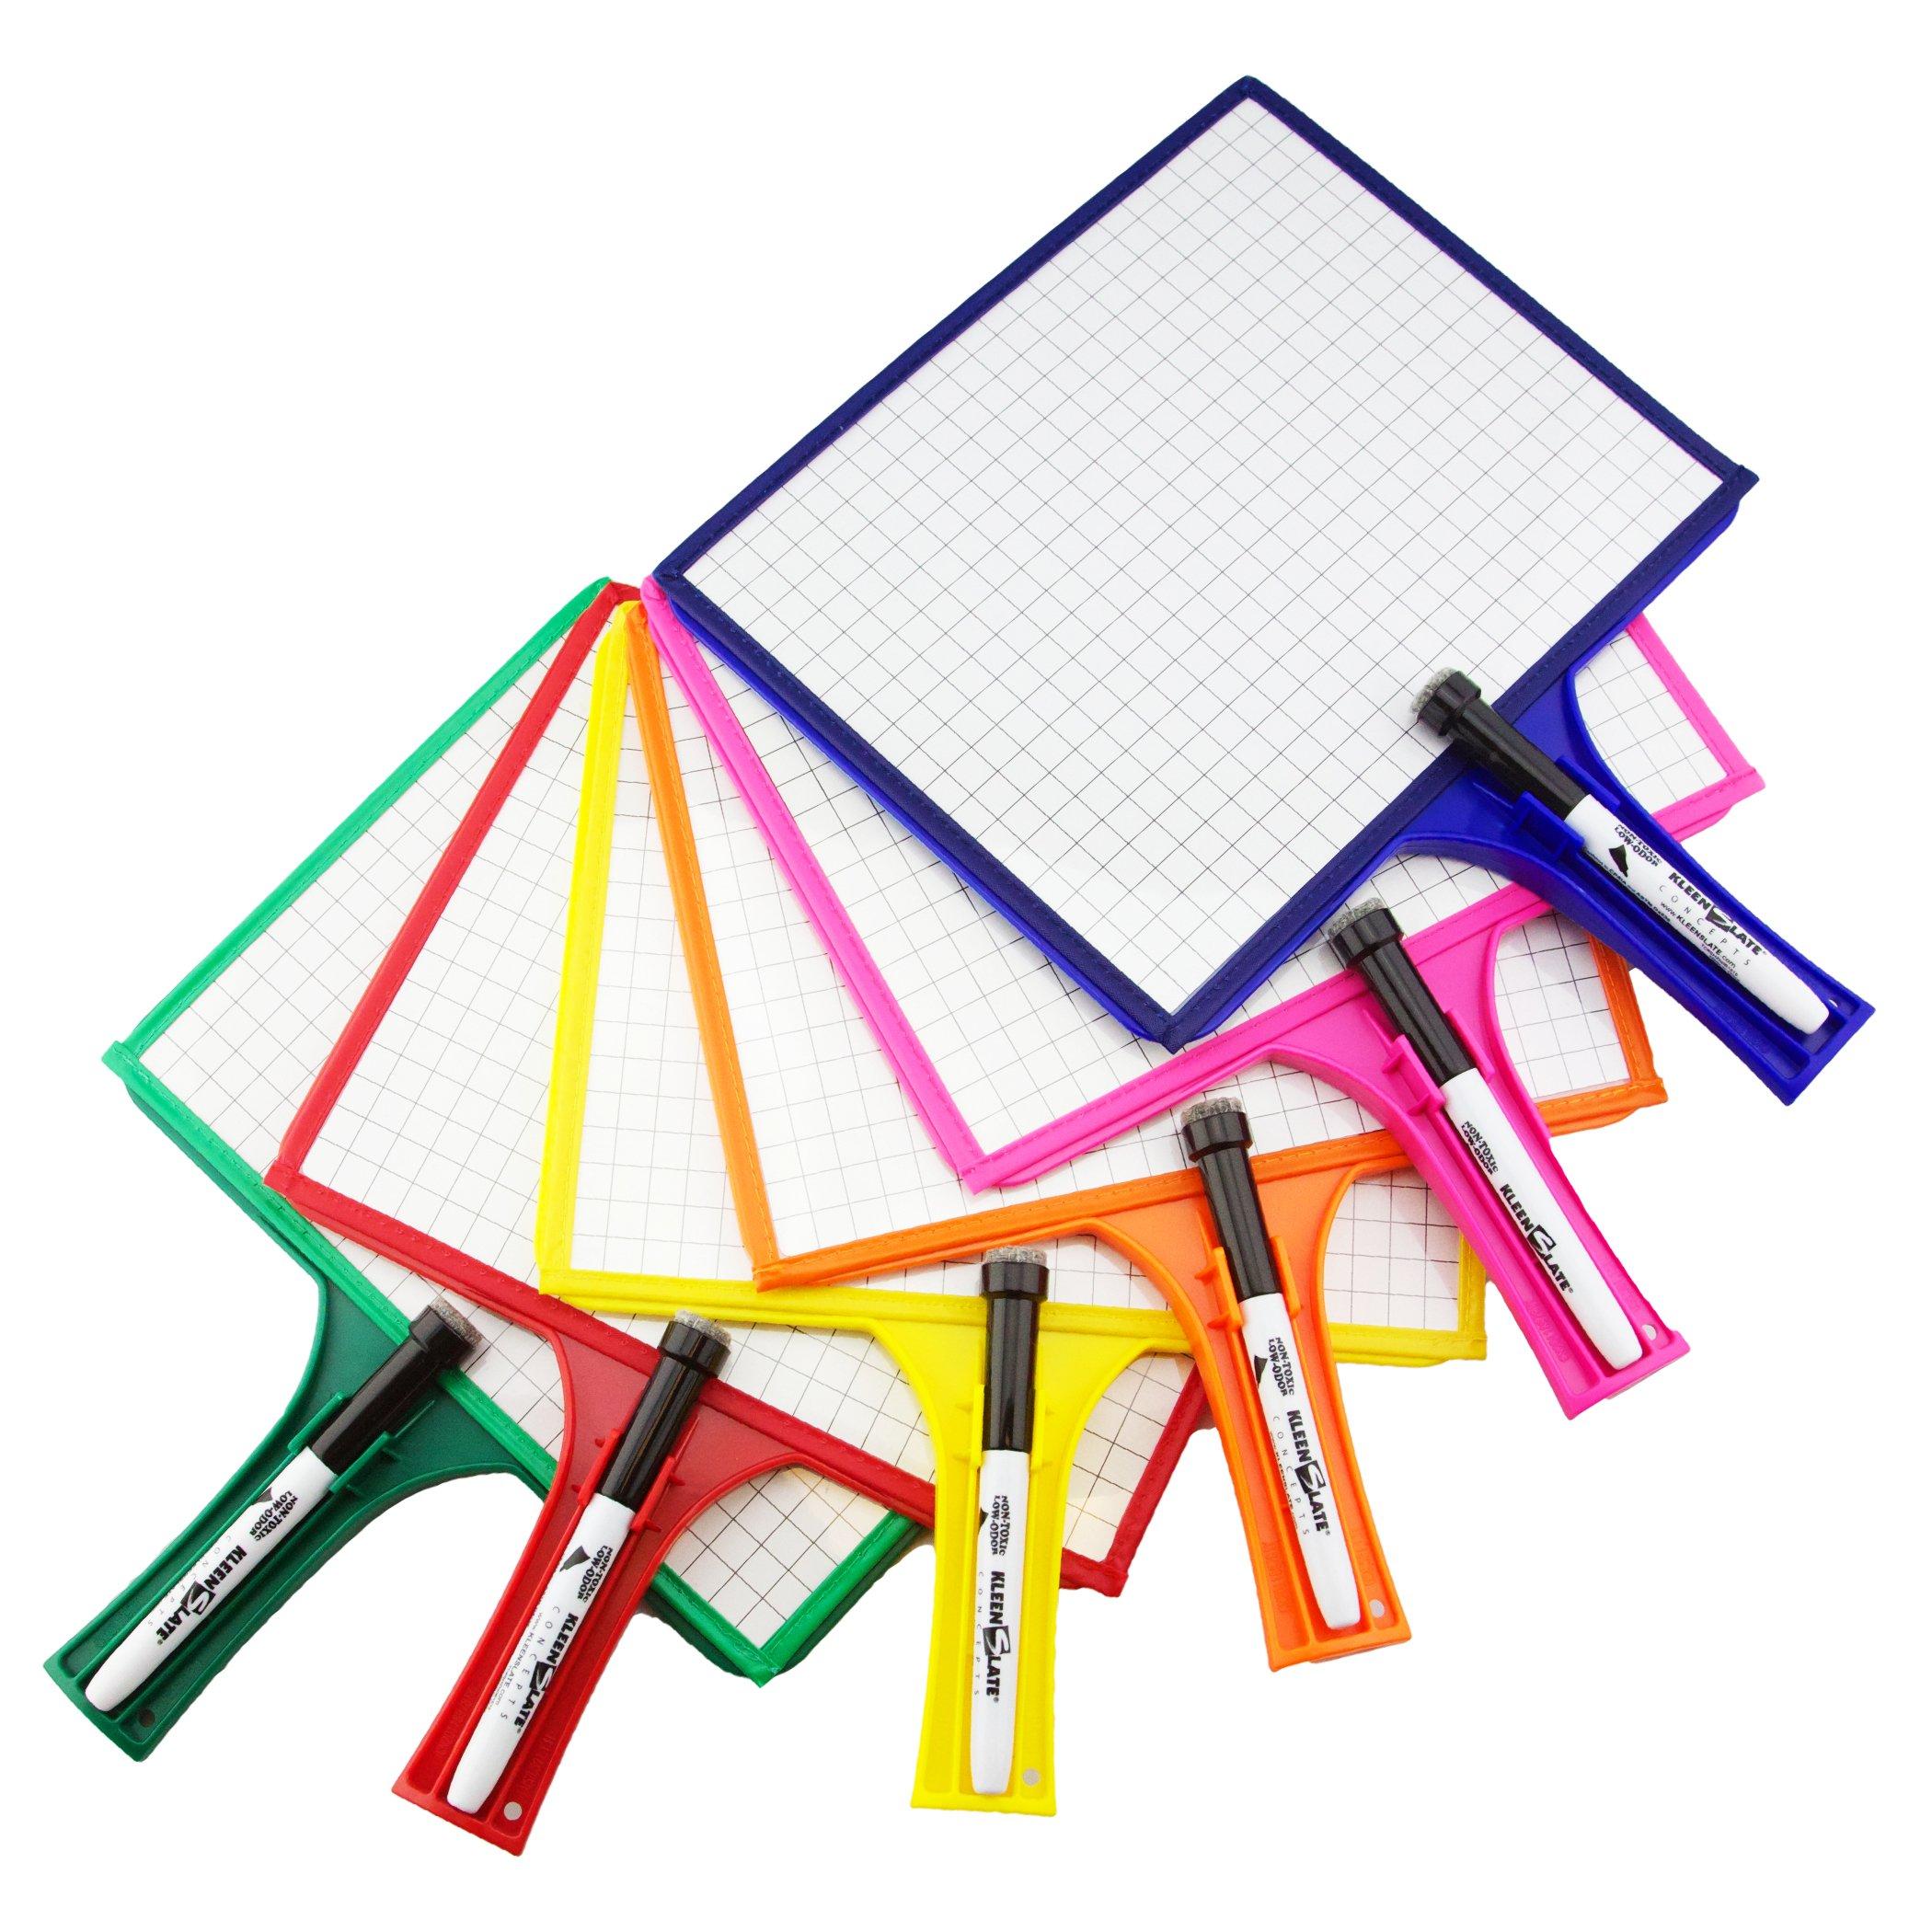 Set of 12 Customizable whiteboards w/Dry Erase Sleeve & Interchangeable Graphic Organizers + Bonus by KleenSlate (Image #3)